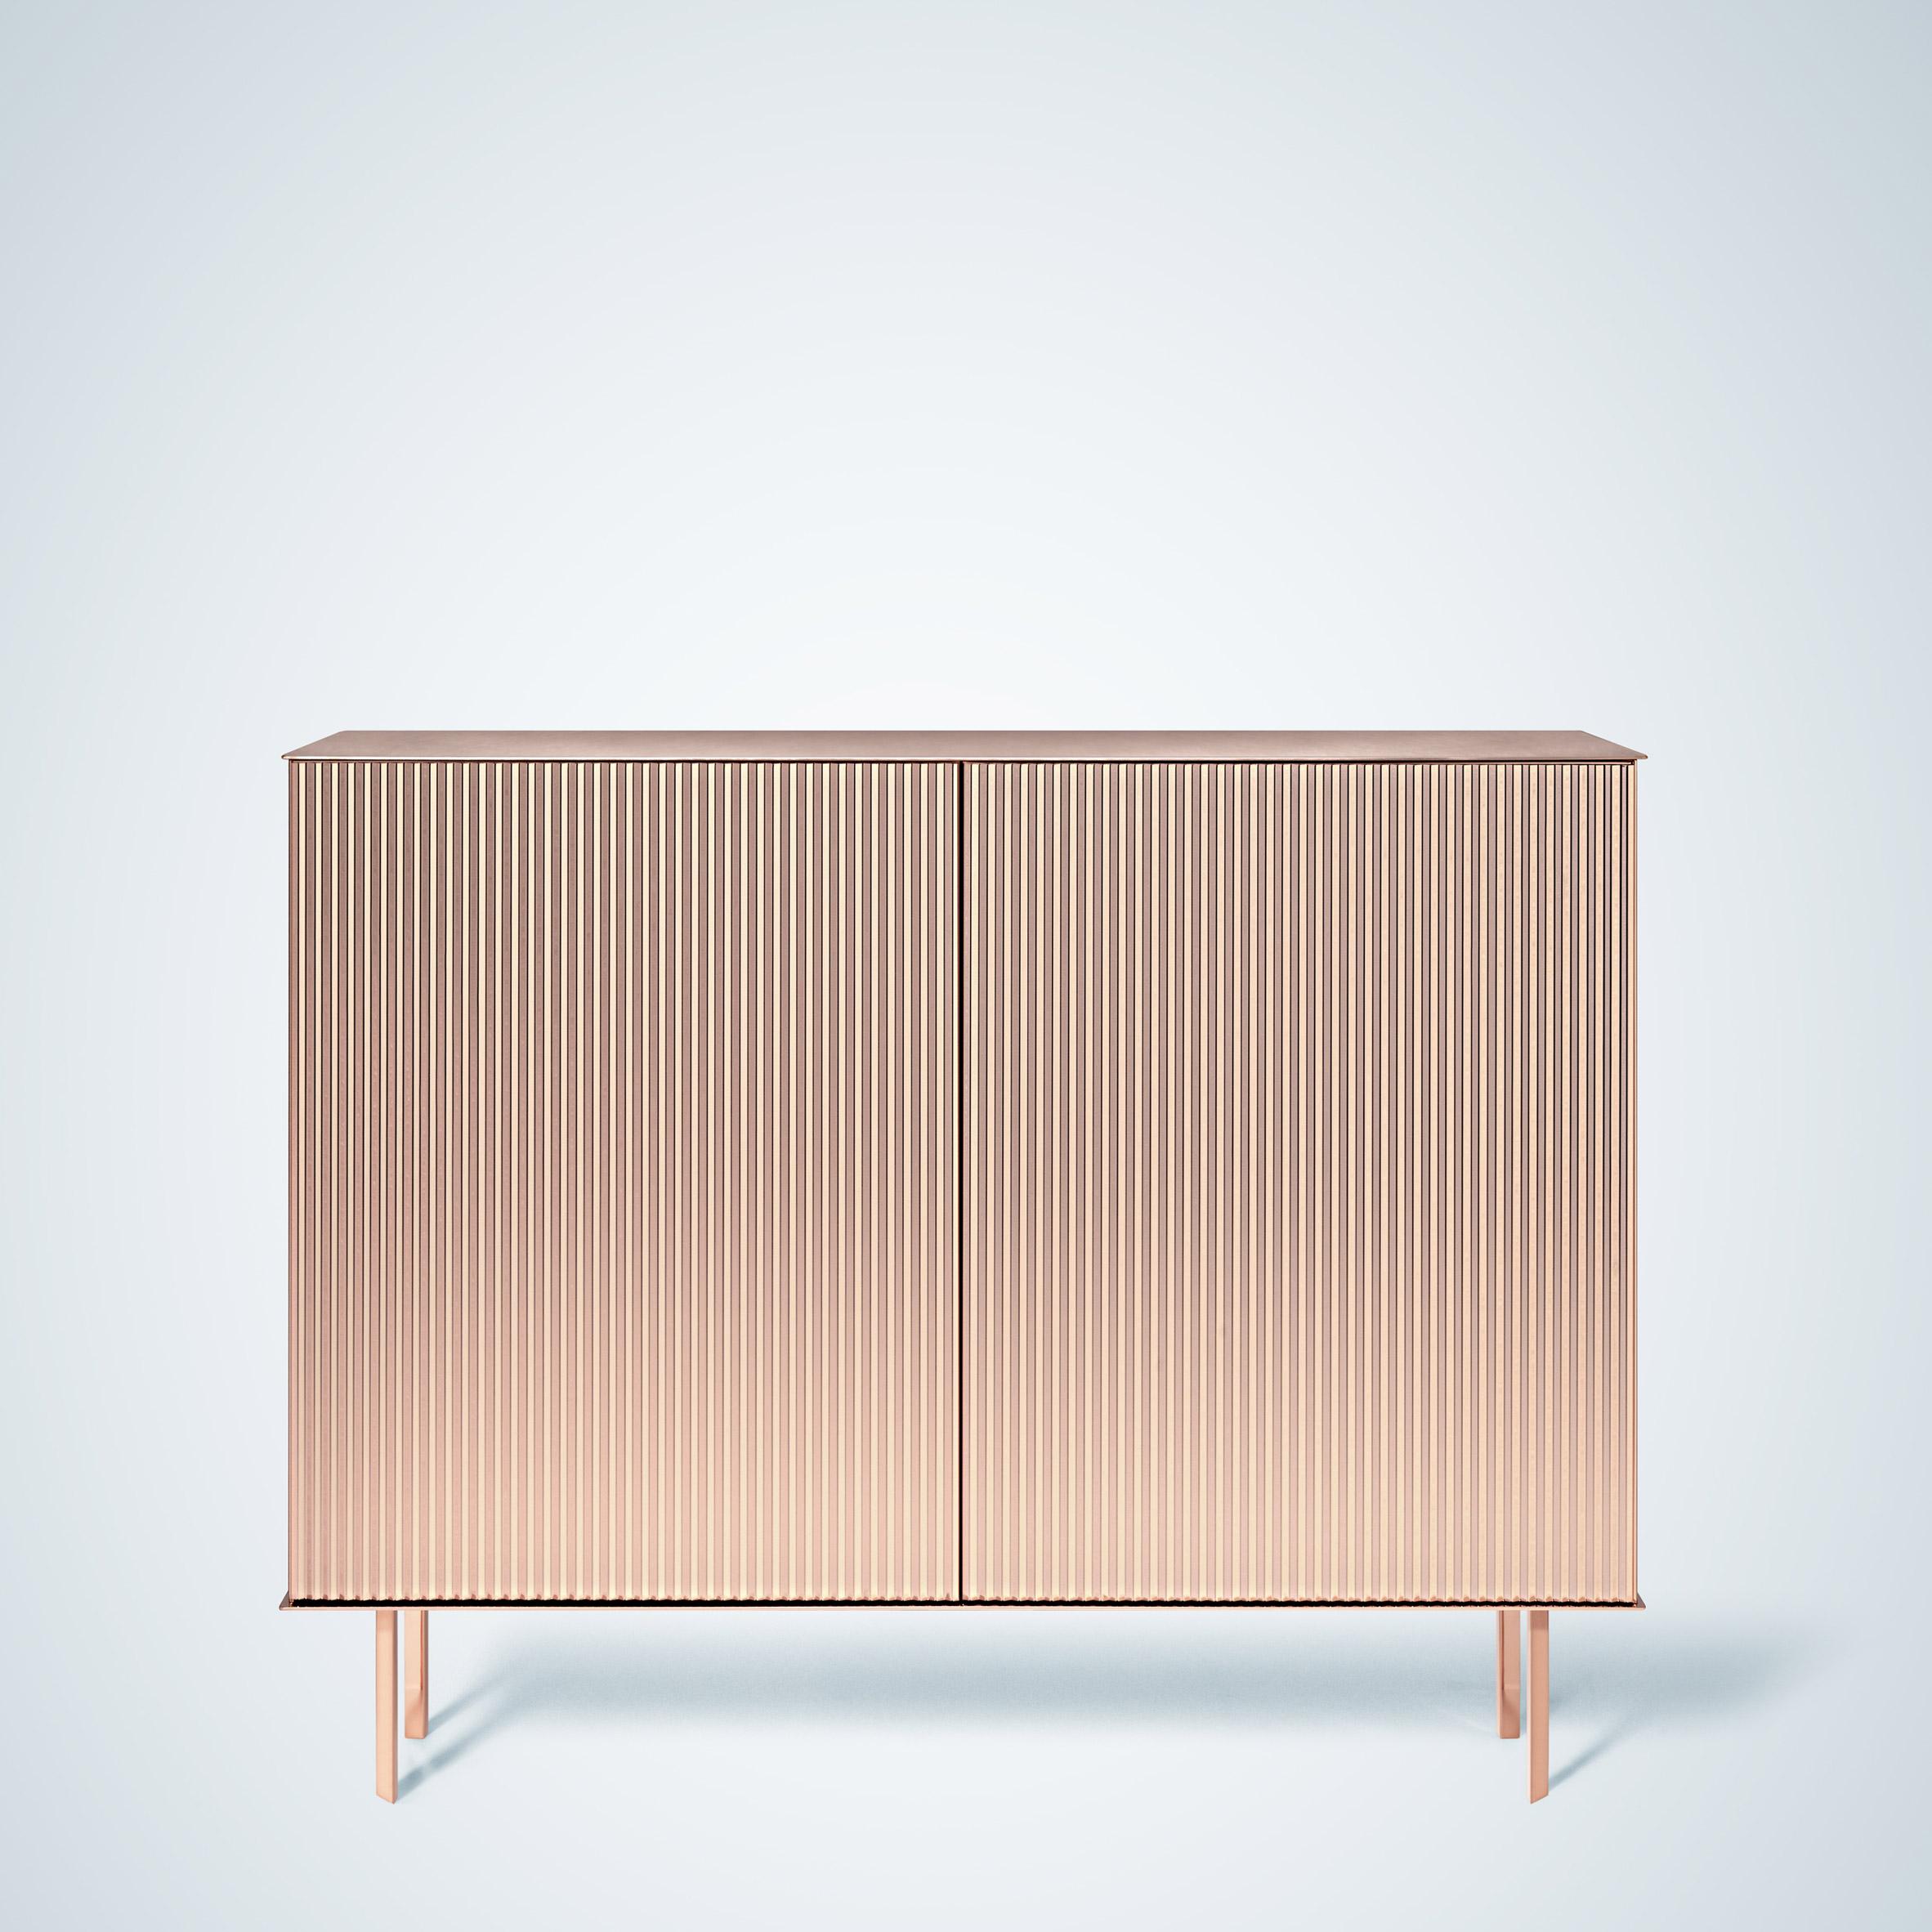 tracing-identity-milan-design-week-furniture_dewez_elizabeth_dezeen_2364_col_2